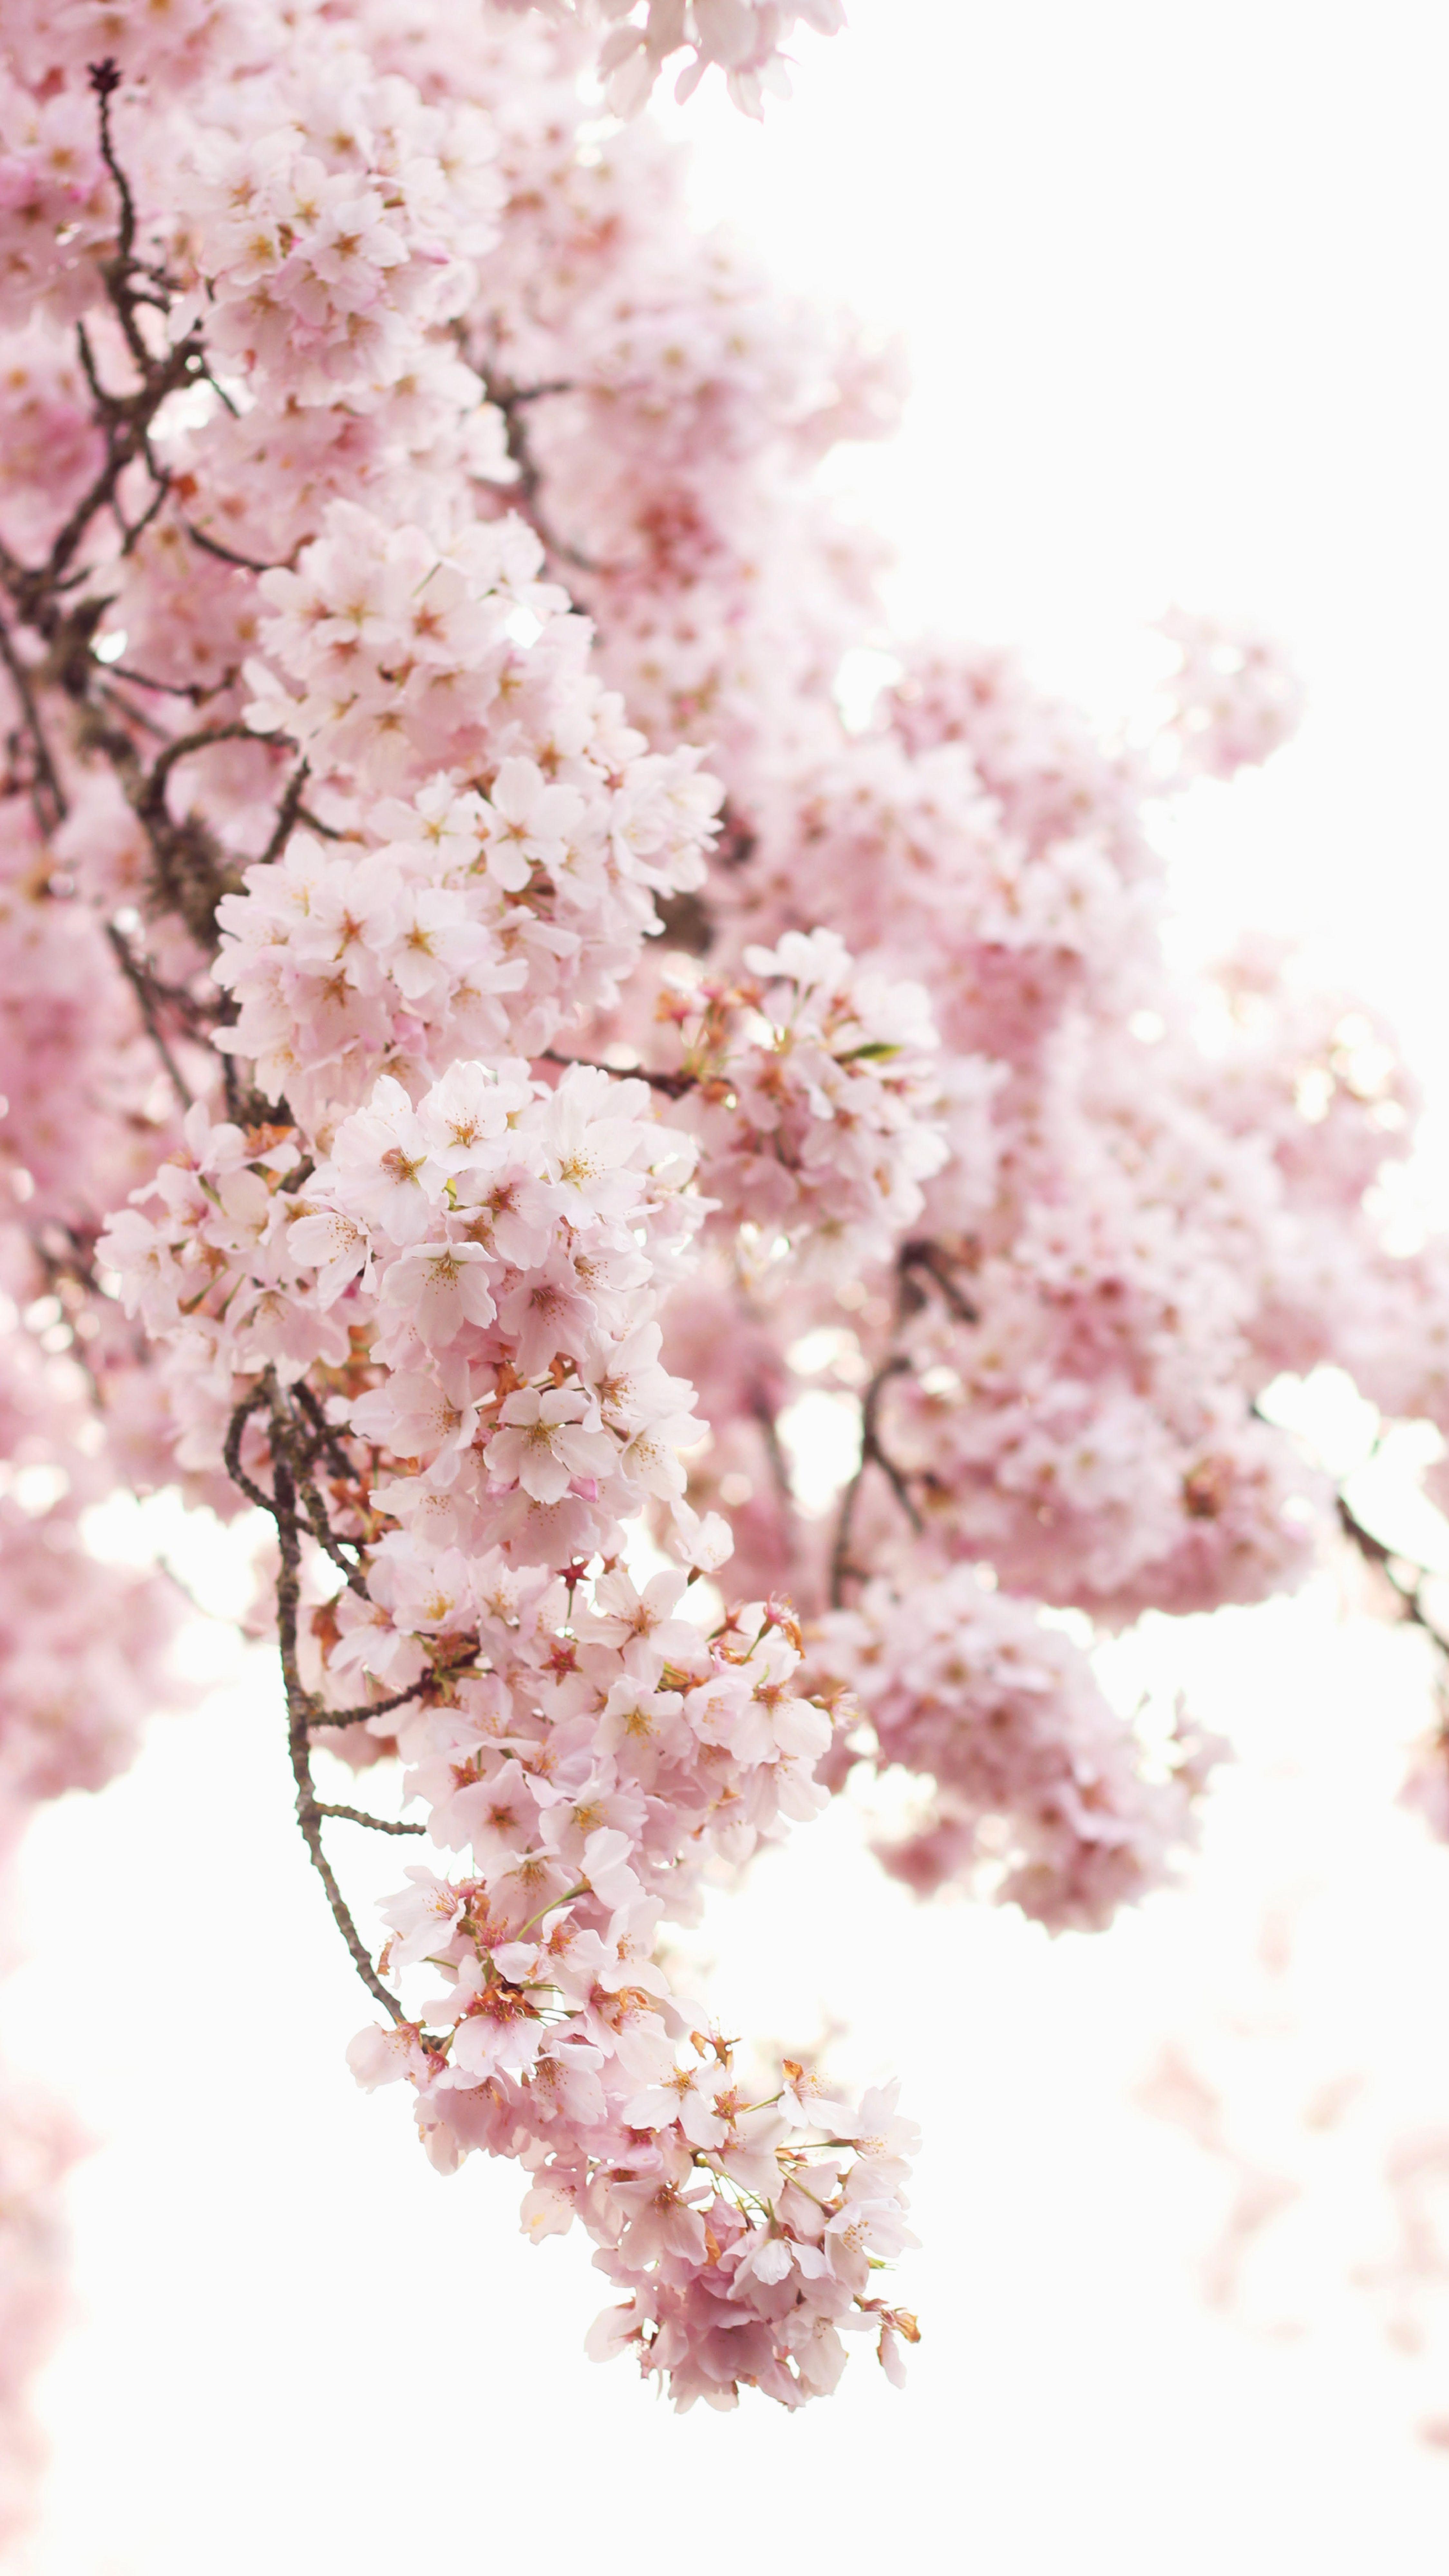 Hanami Flower Viewing Vintage Asian Art Nature Pictures Blossom